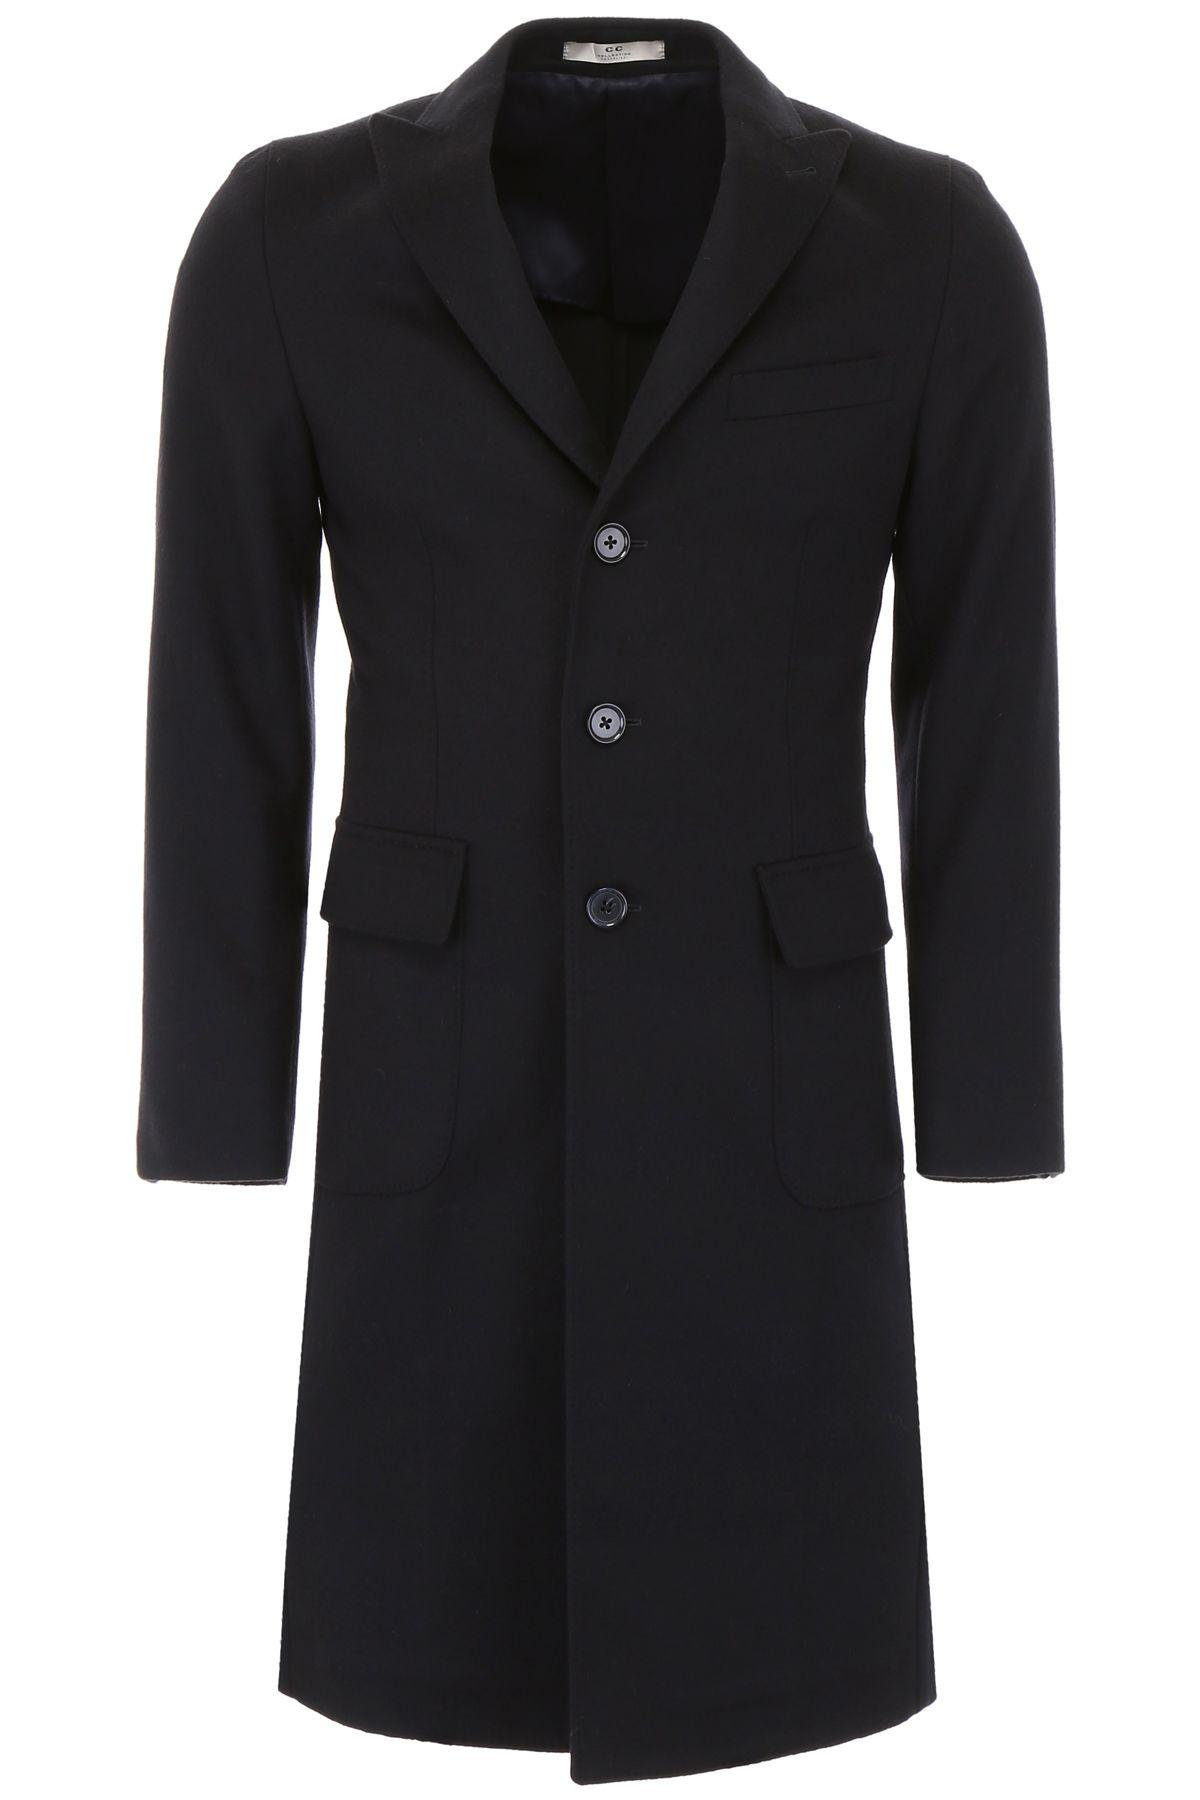 CC COLLECTION CORNELIANI Wool Coat in Navy